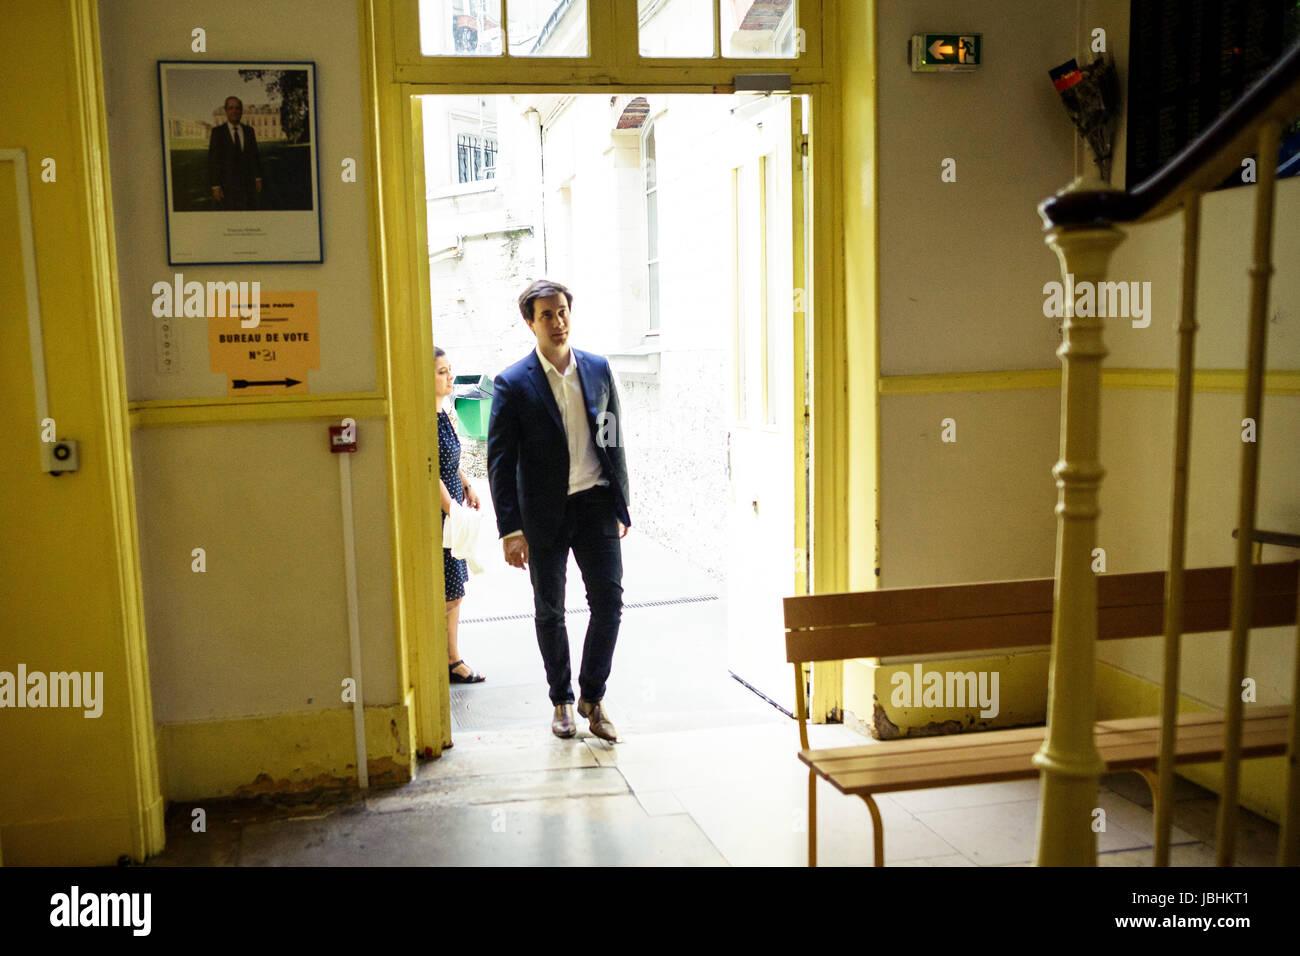 Legislatives french elections photos & legislatives french elections